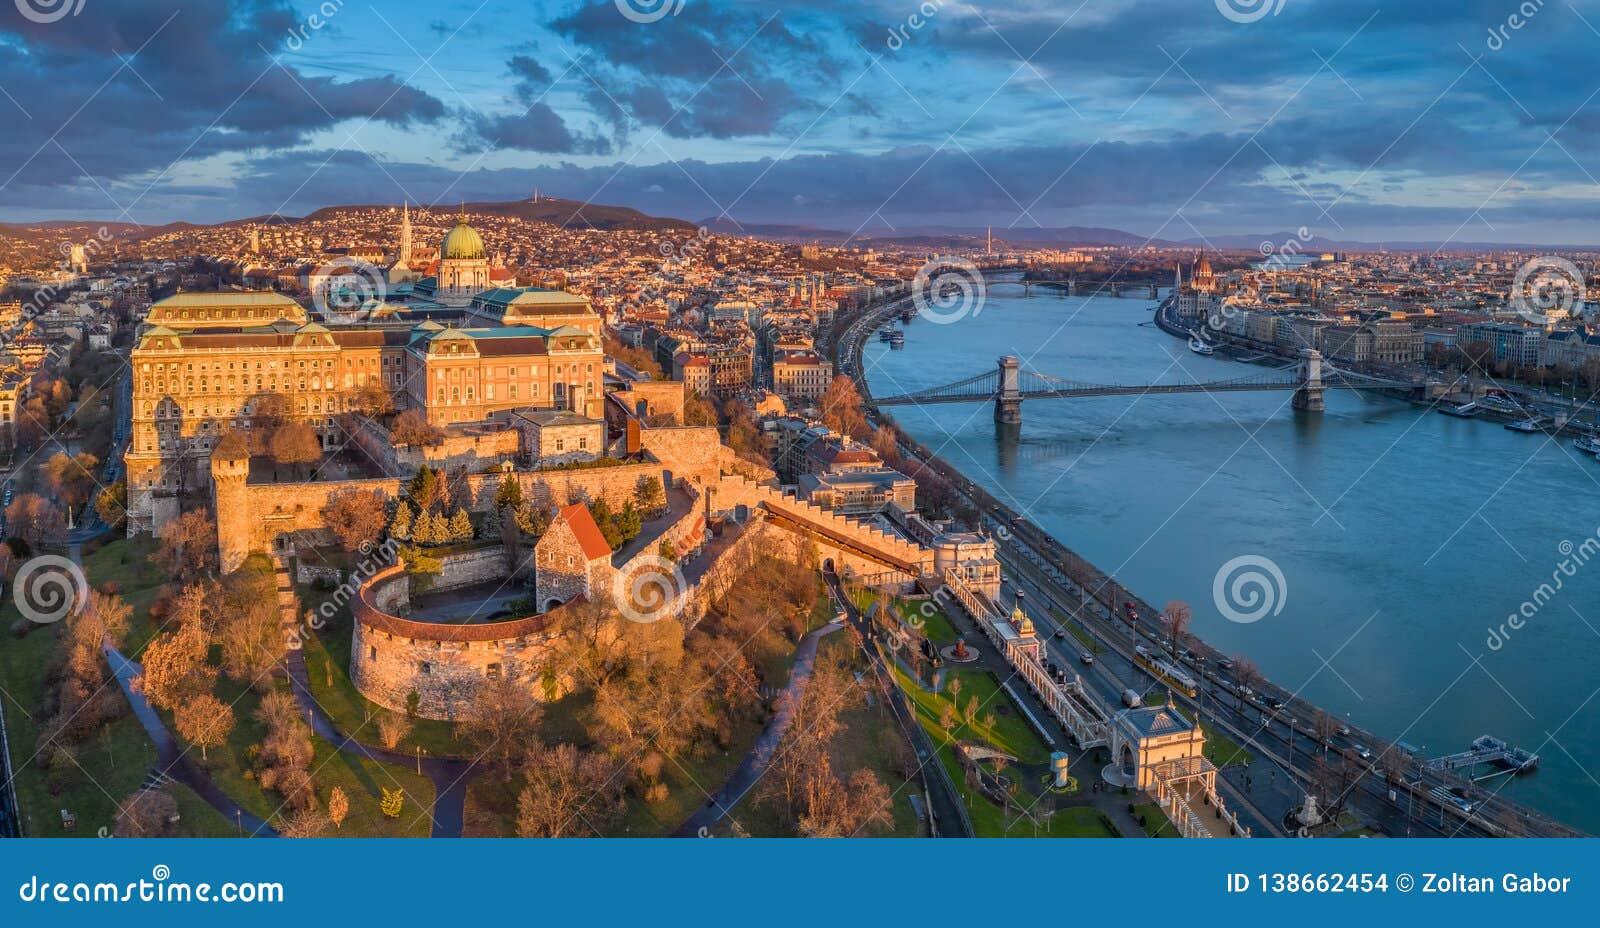 Budapest Ungern - flyg- panoramautsikt av Buda Castle Royal Palace med den Szechenyi kedjebron, parlament